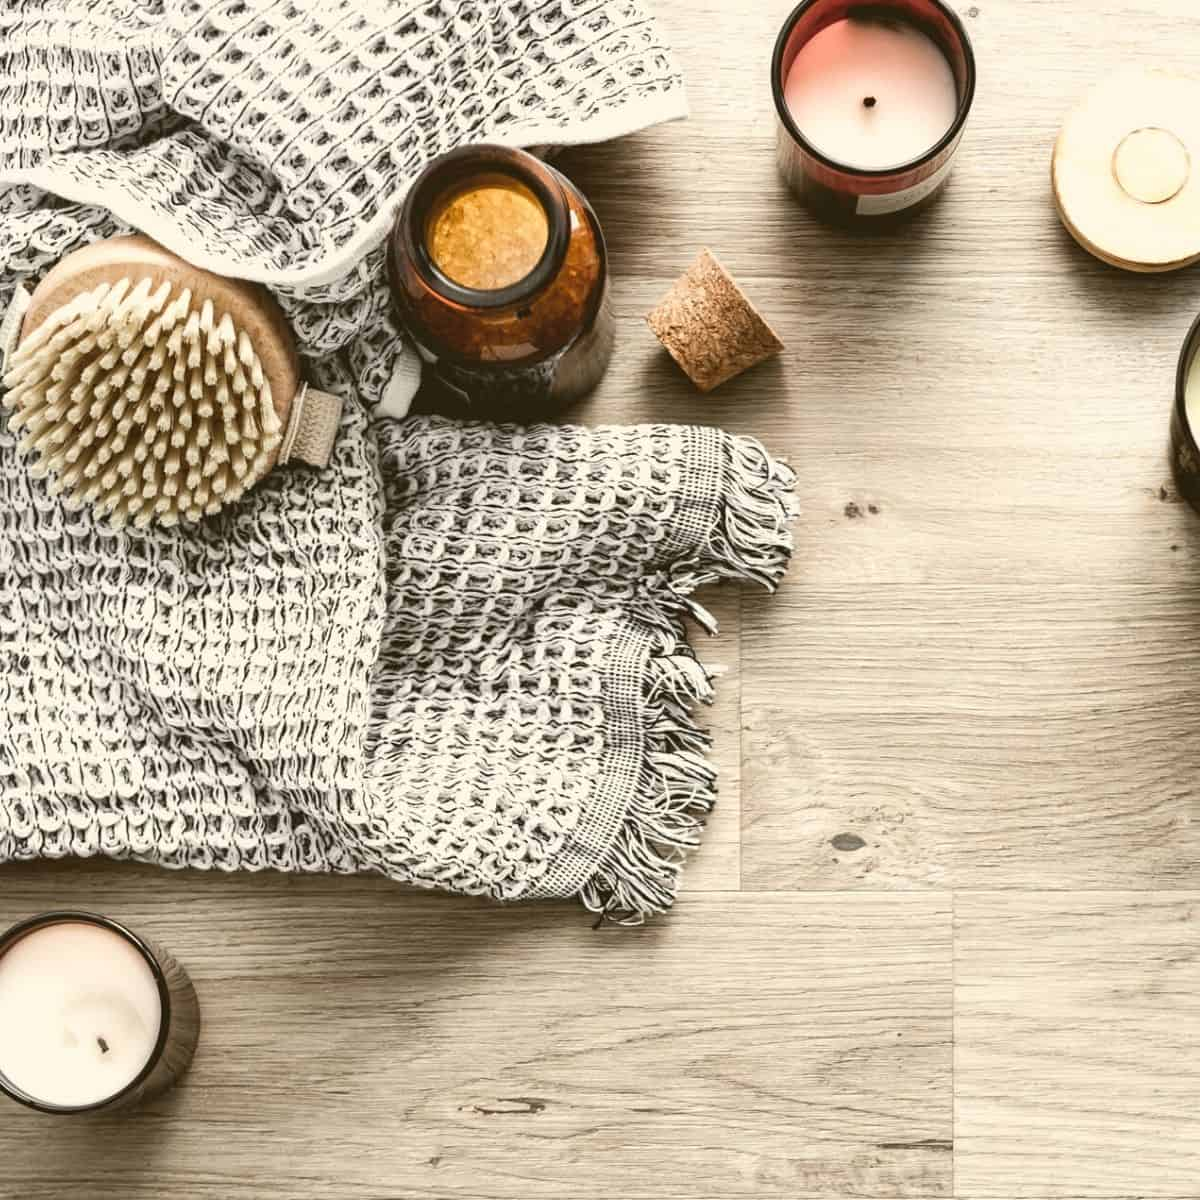 handmade washcloth and candles